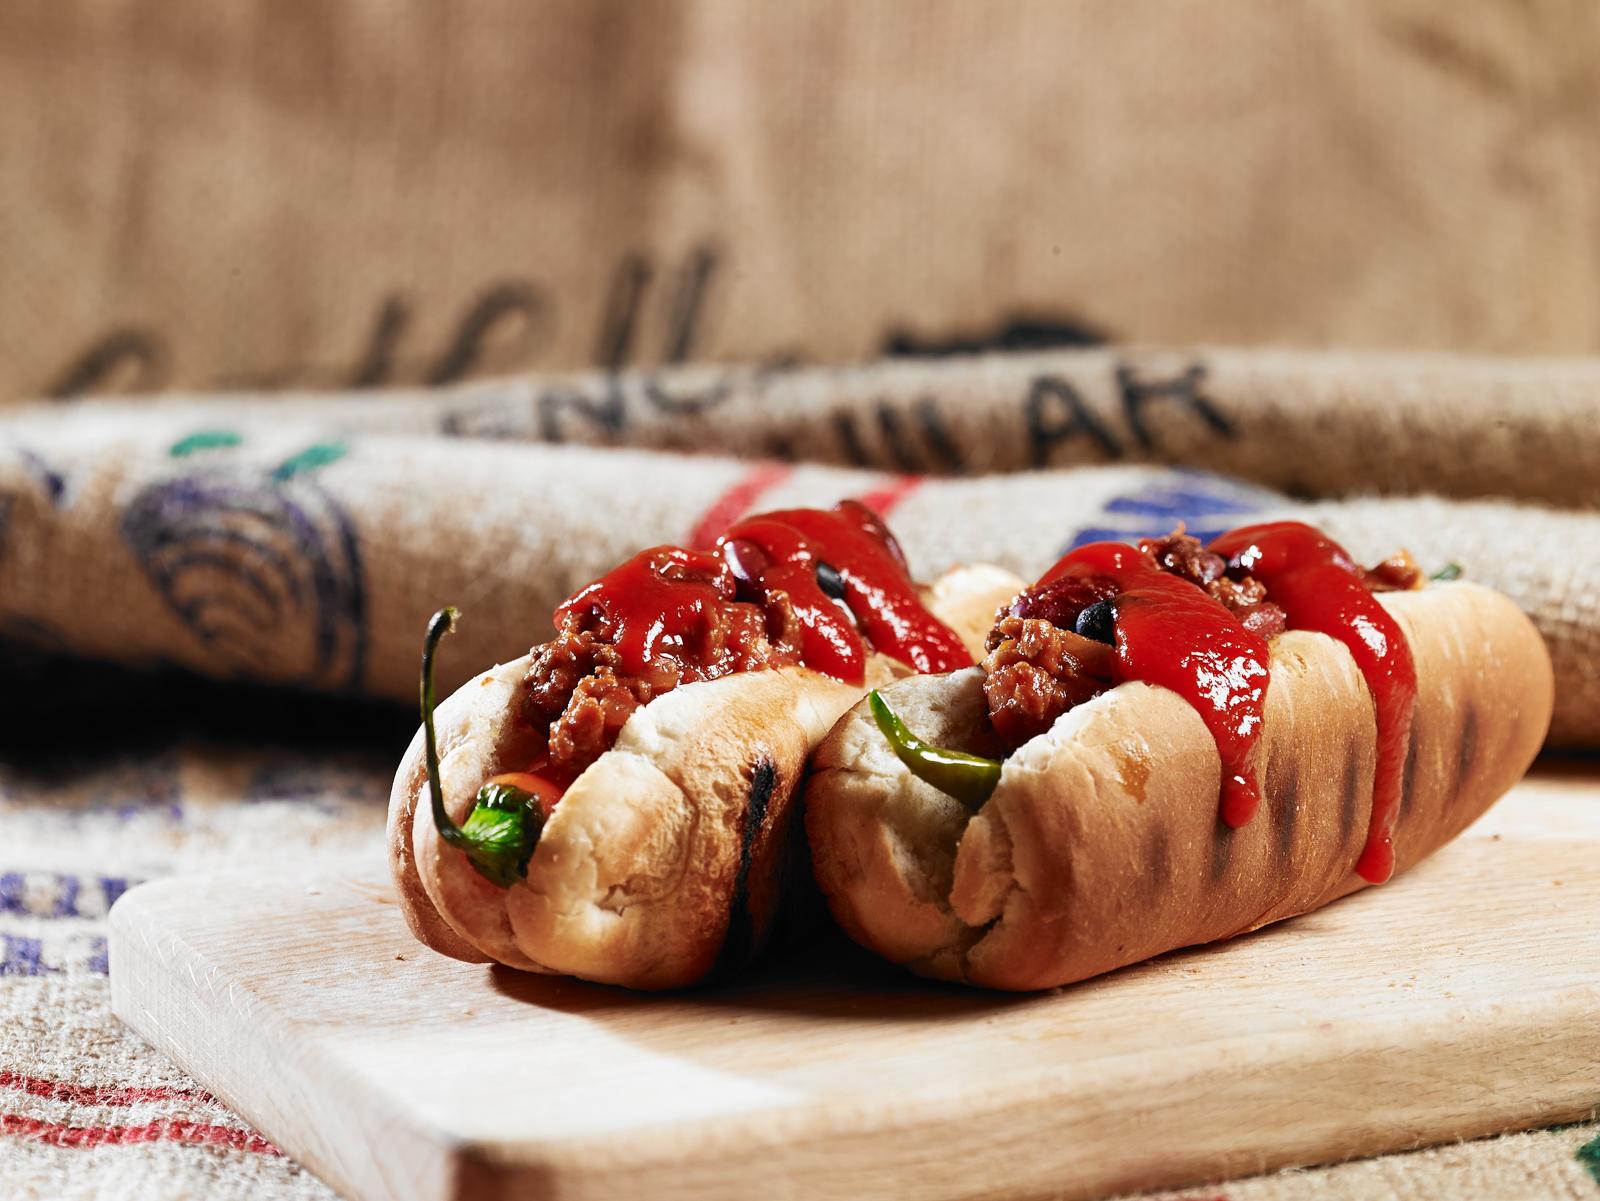 chili cookbook_005.jpg